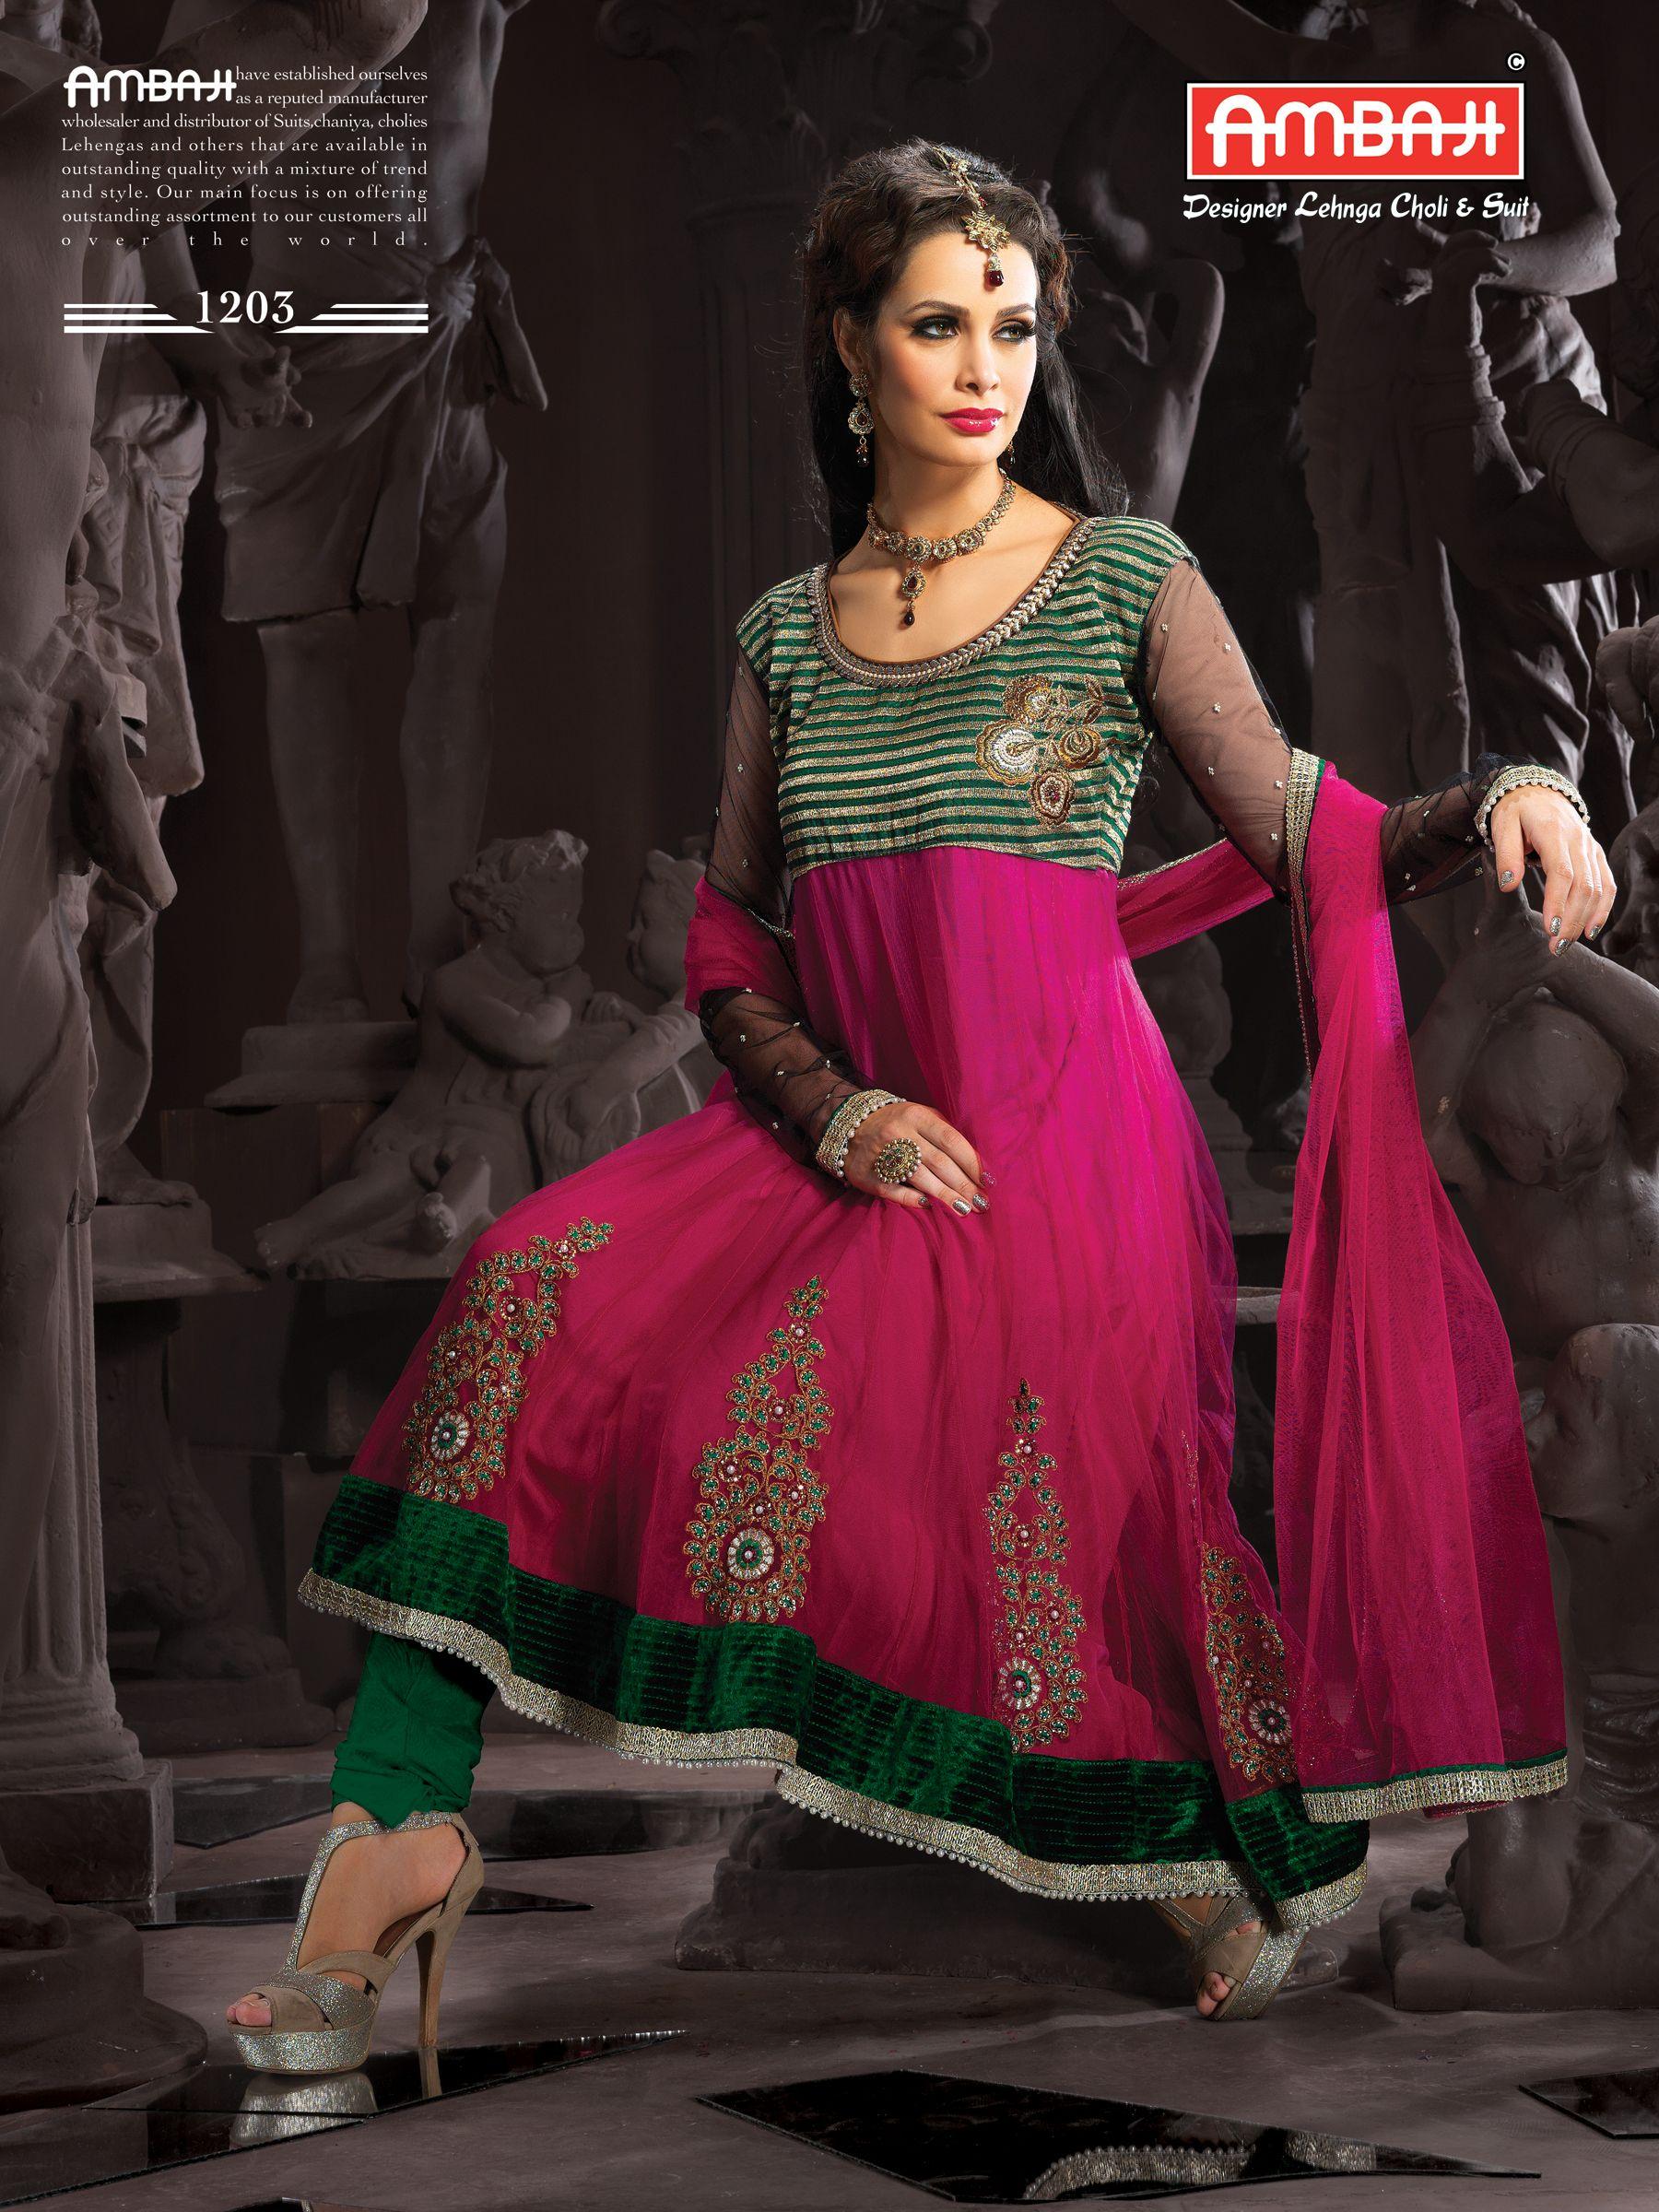 4ff7354b1b Ambaji creation product code :- 1203 Salwar Suite pink Color , net  Dupatta-Fabrics , net Top -Febrics , Dhupion Choli-Fabrics , santoon  Lininig , contect ...